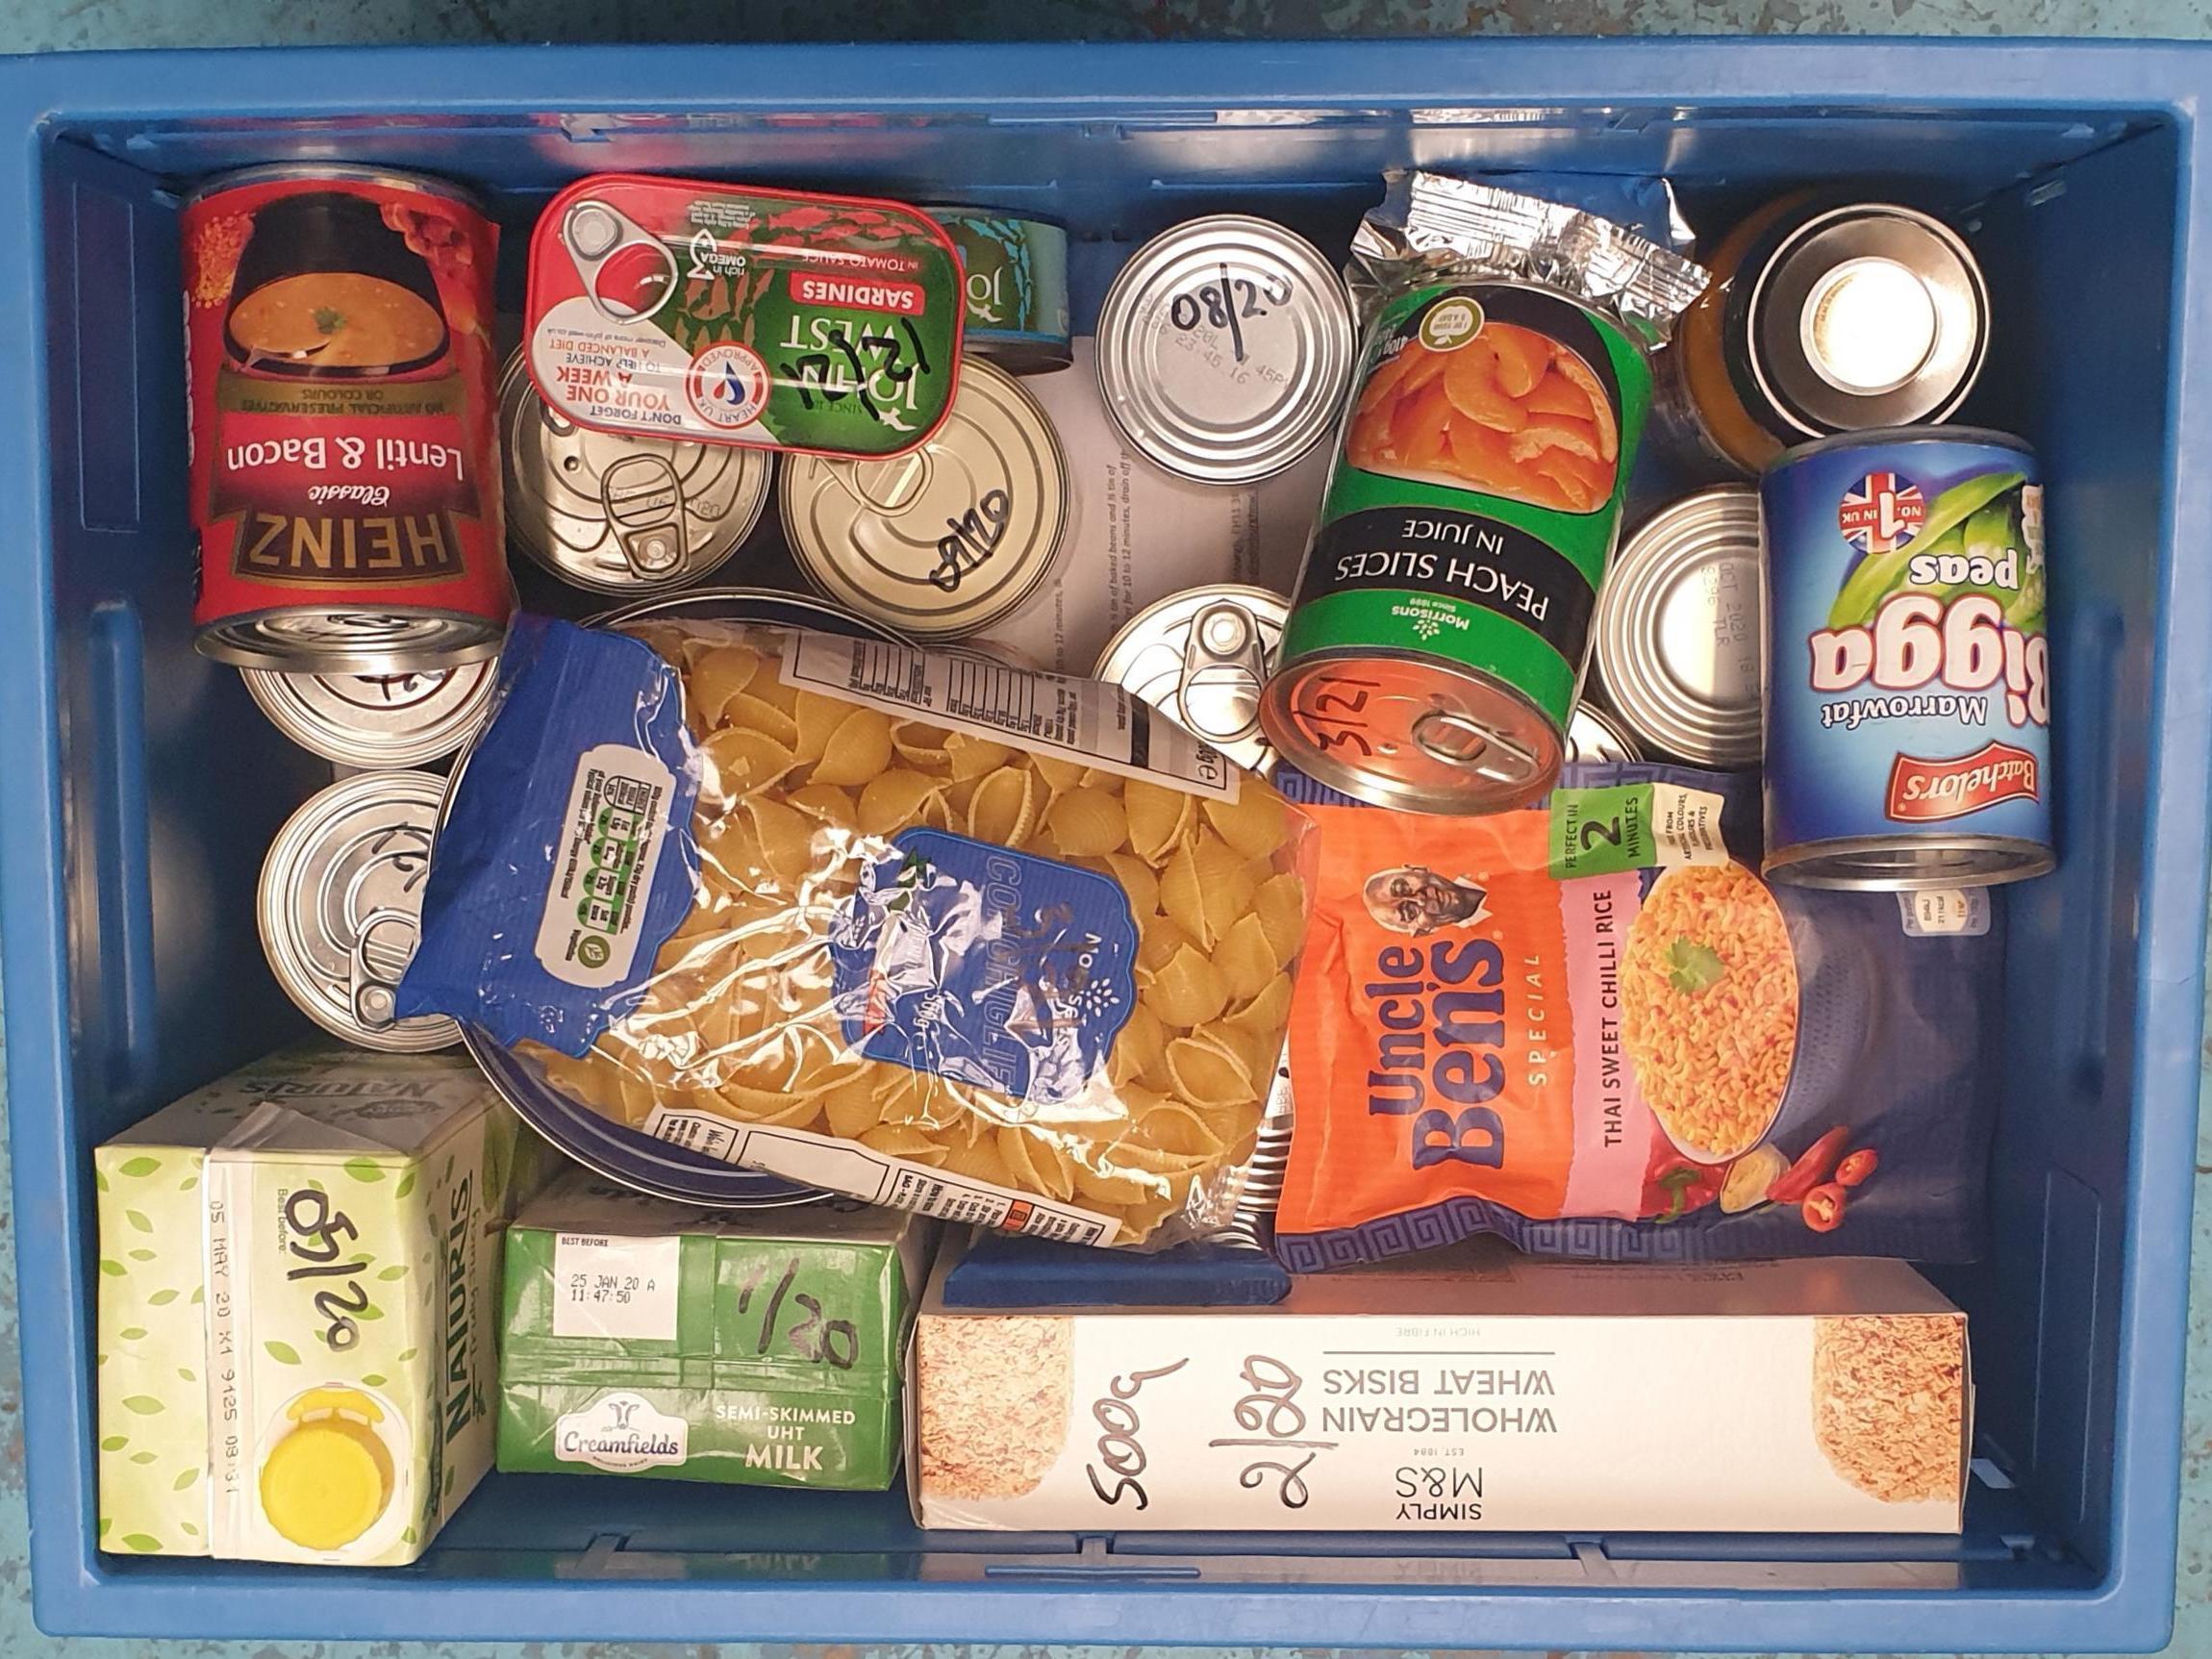 Edinburgh food bank users 'on brink of starvation as supplies run low amid soaring demand'